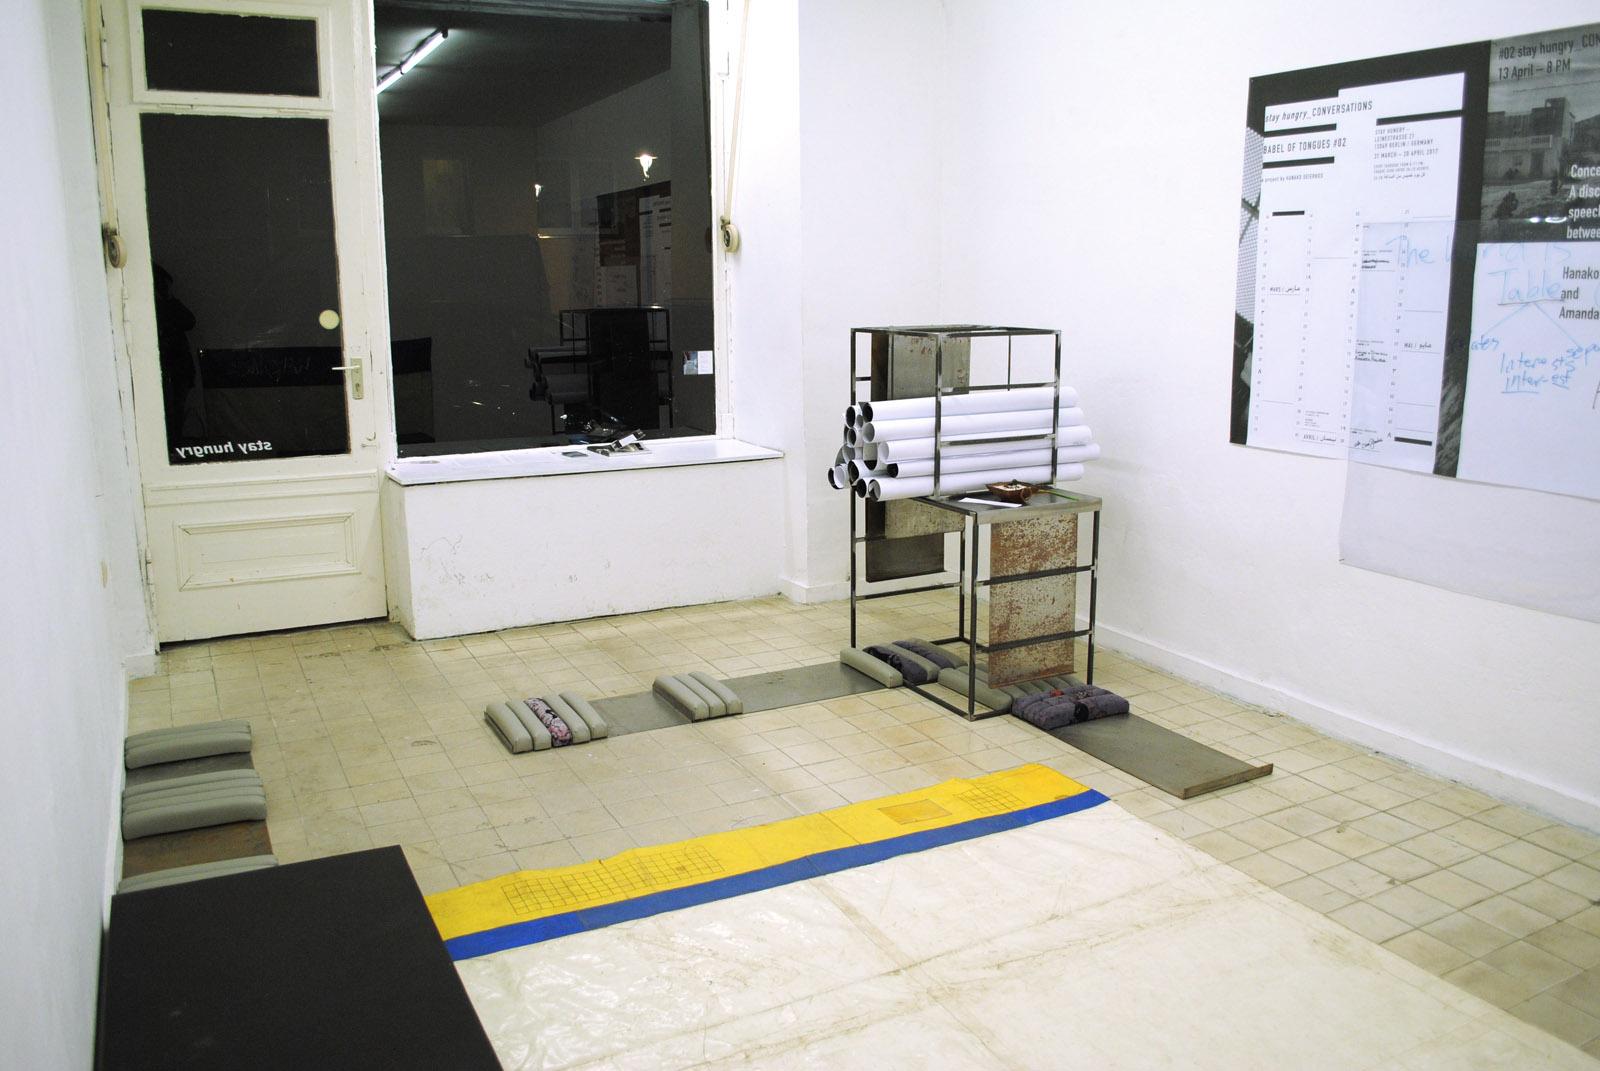 stay hungry Hanako Geierhos Amanda Holmes conversation#02 Berlin Art Kunst project space